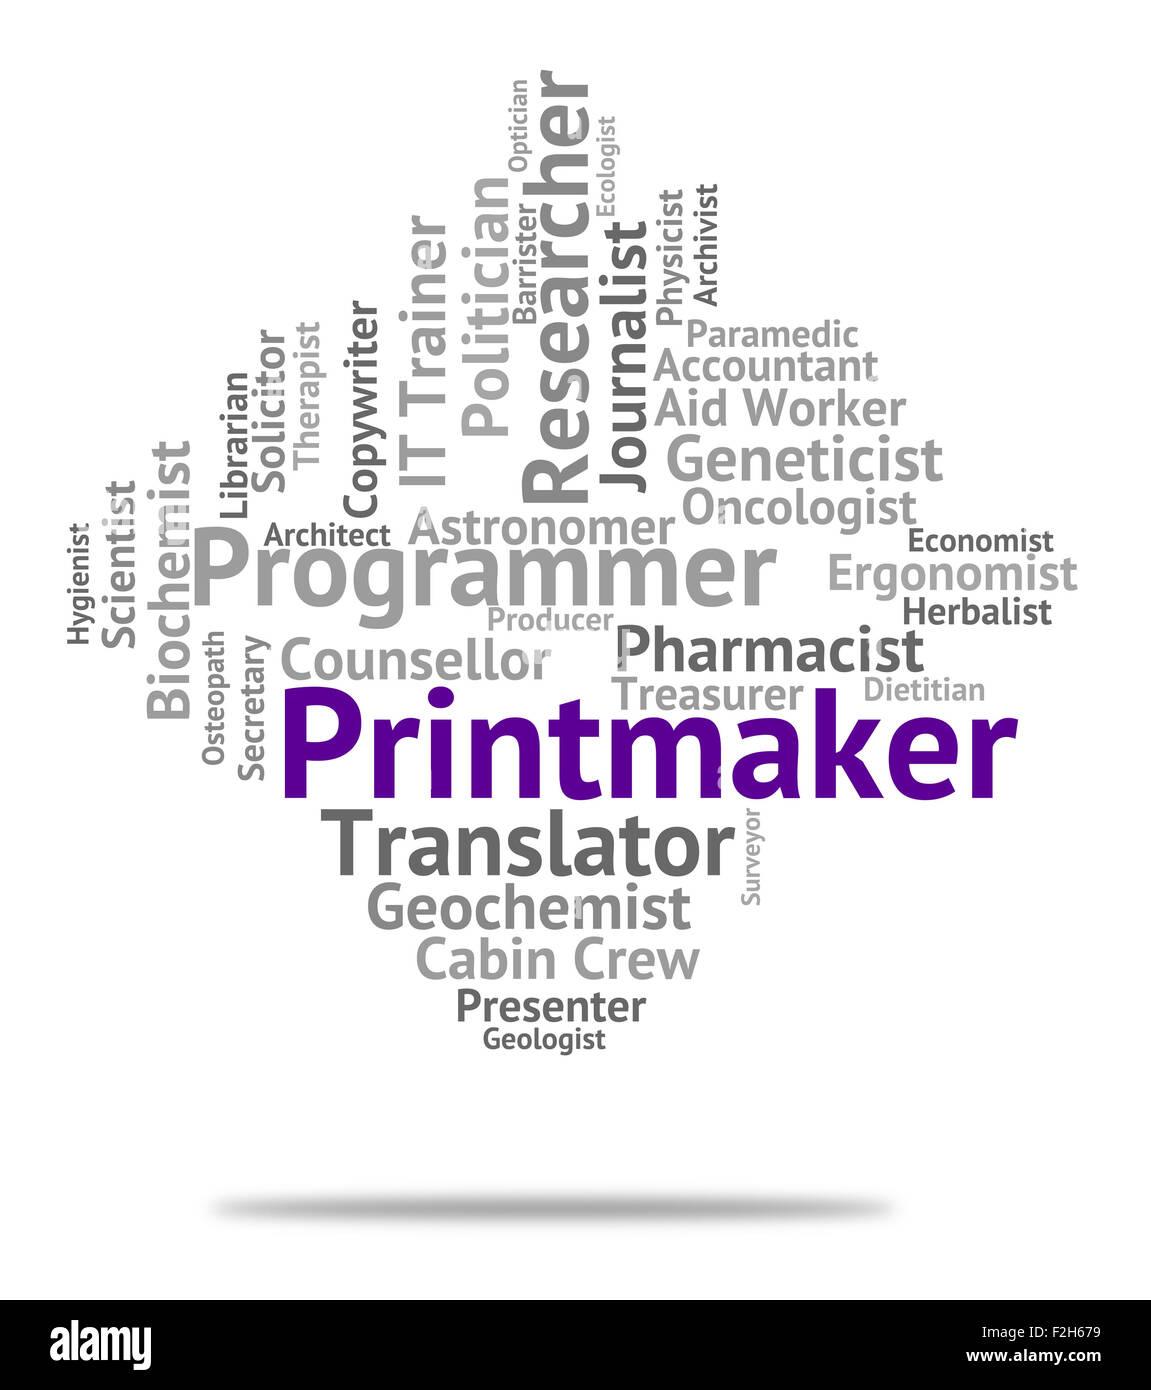 Printmaker Job Representing Hire Words And Career - Stock Image